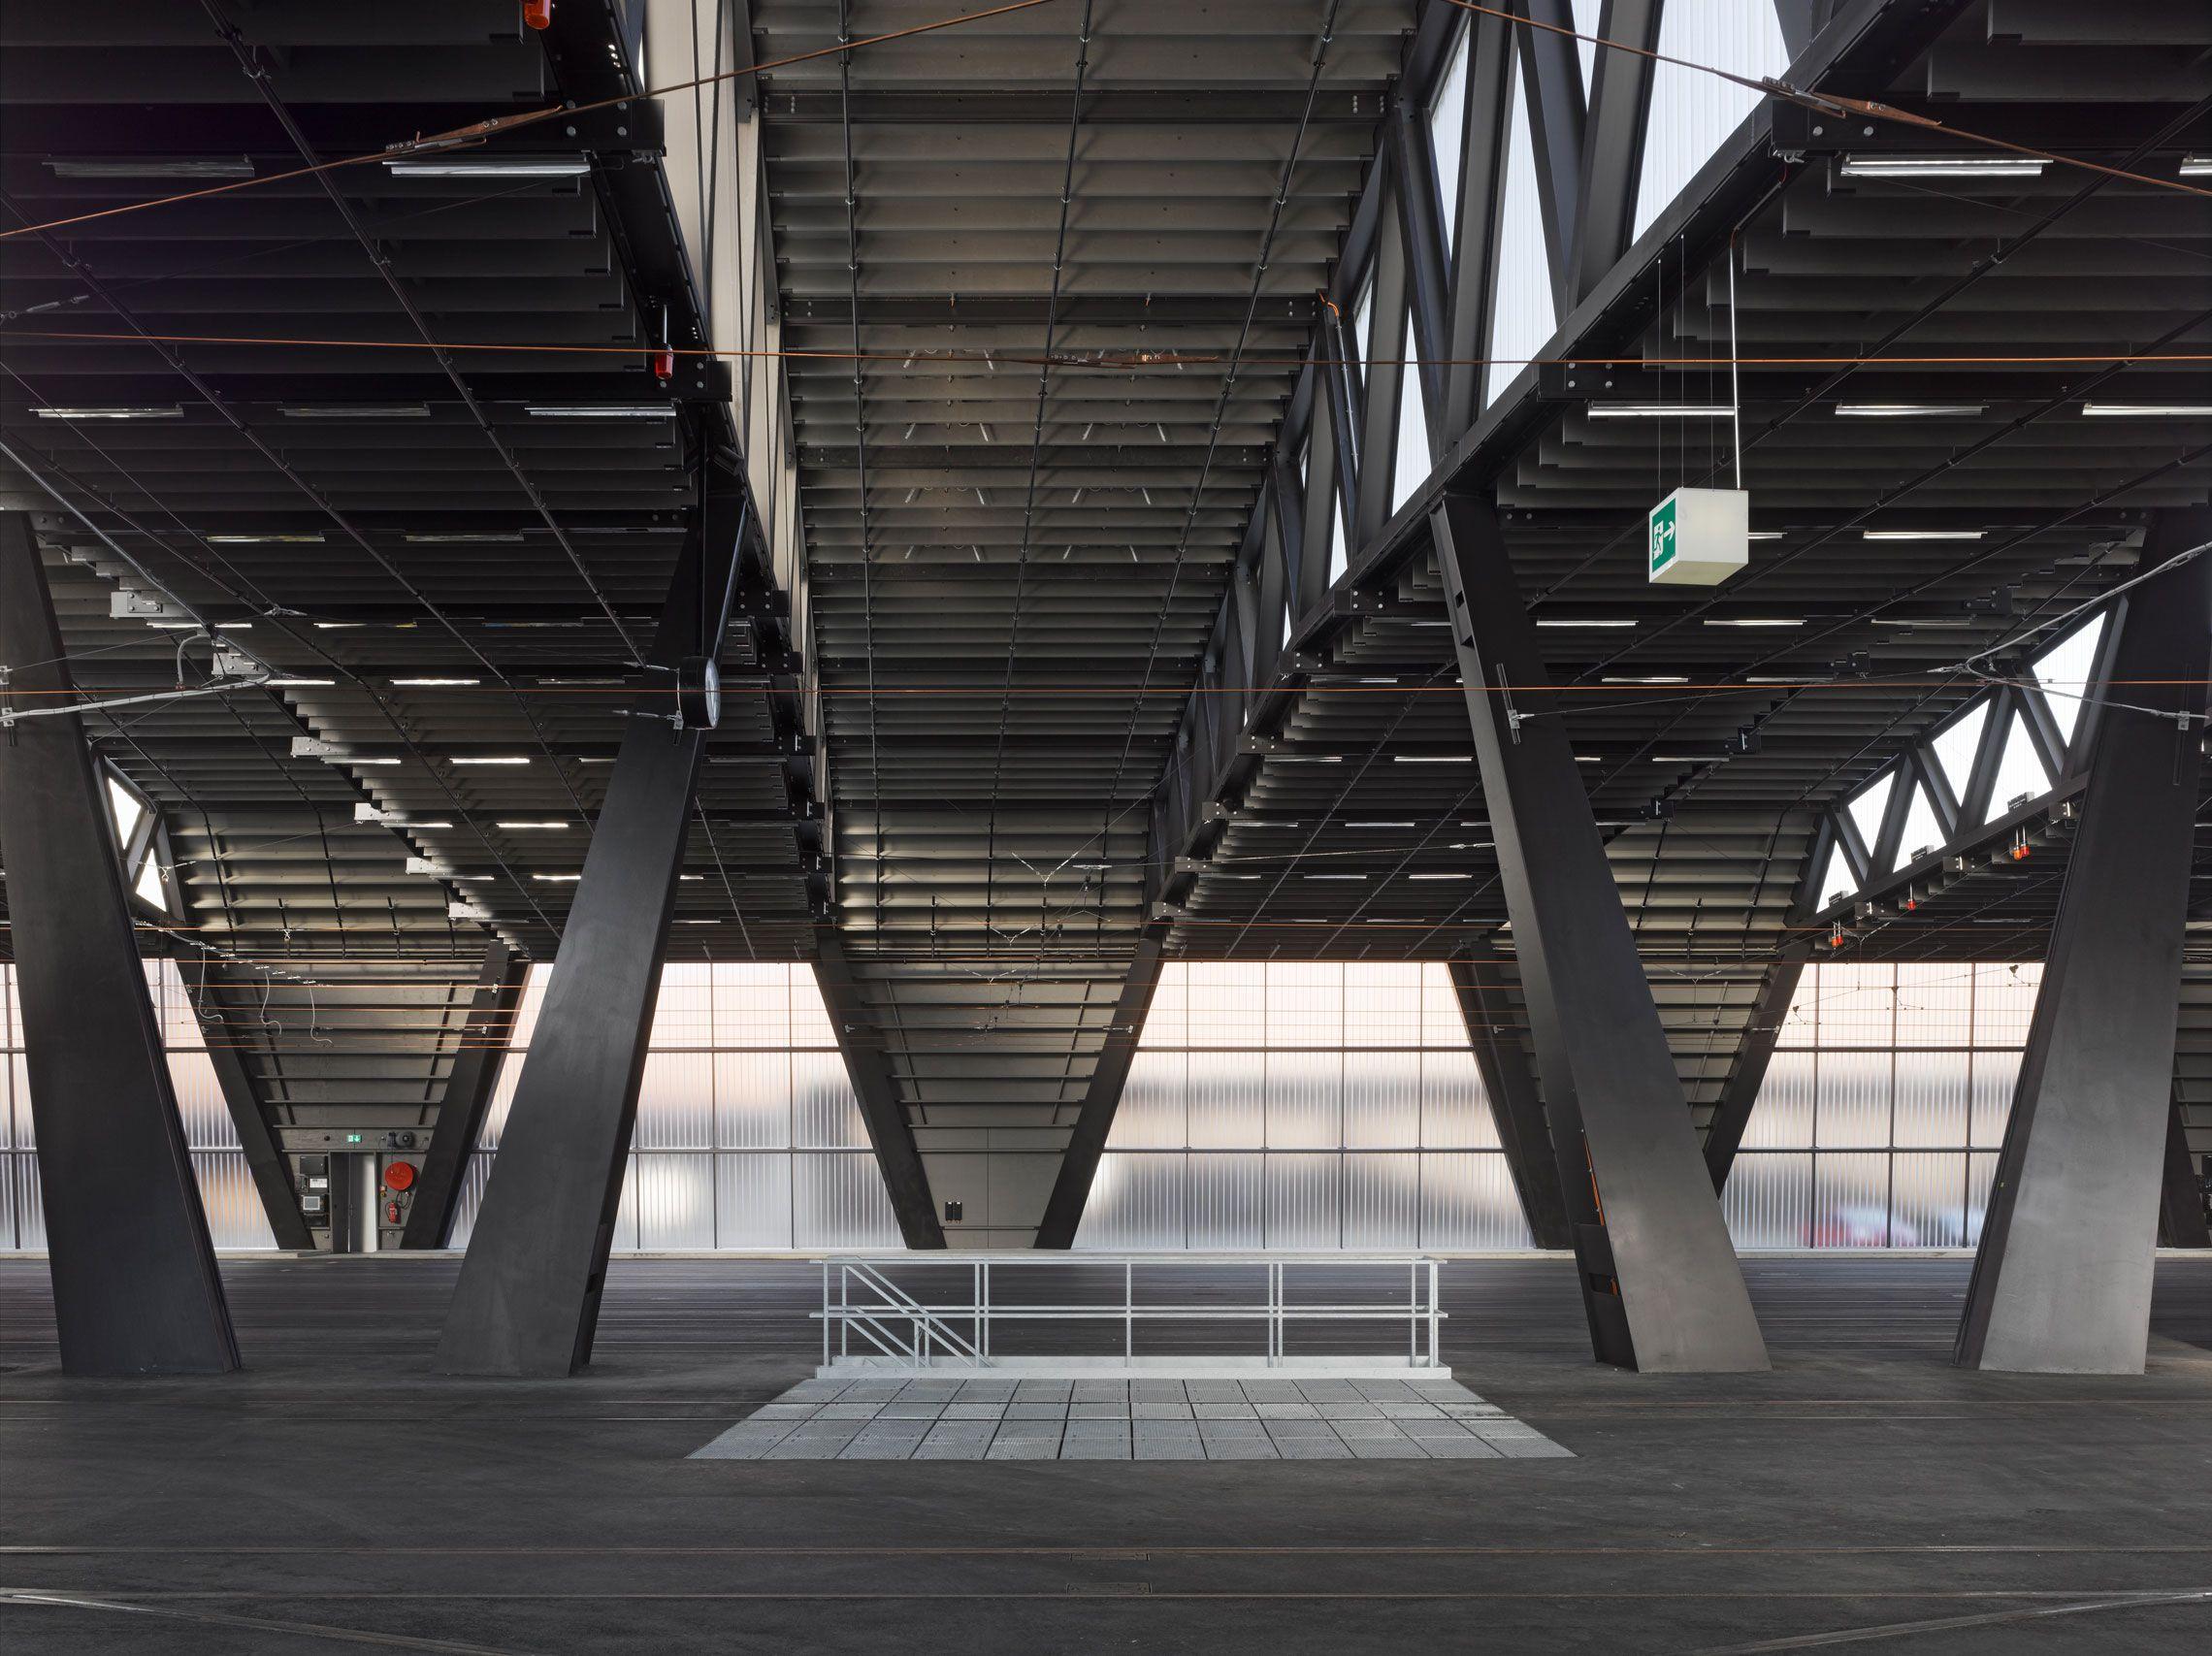 Penzel Valier New Tramdepot Bern Architecture Industrial Architecture Contemporary Architecture